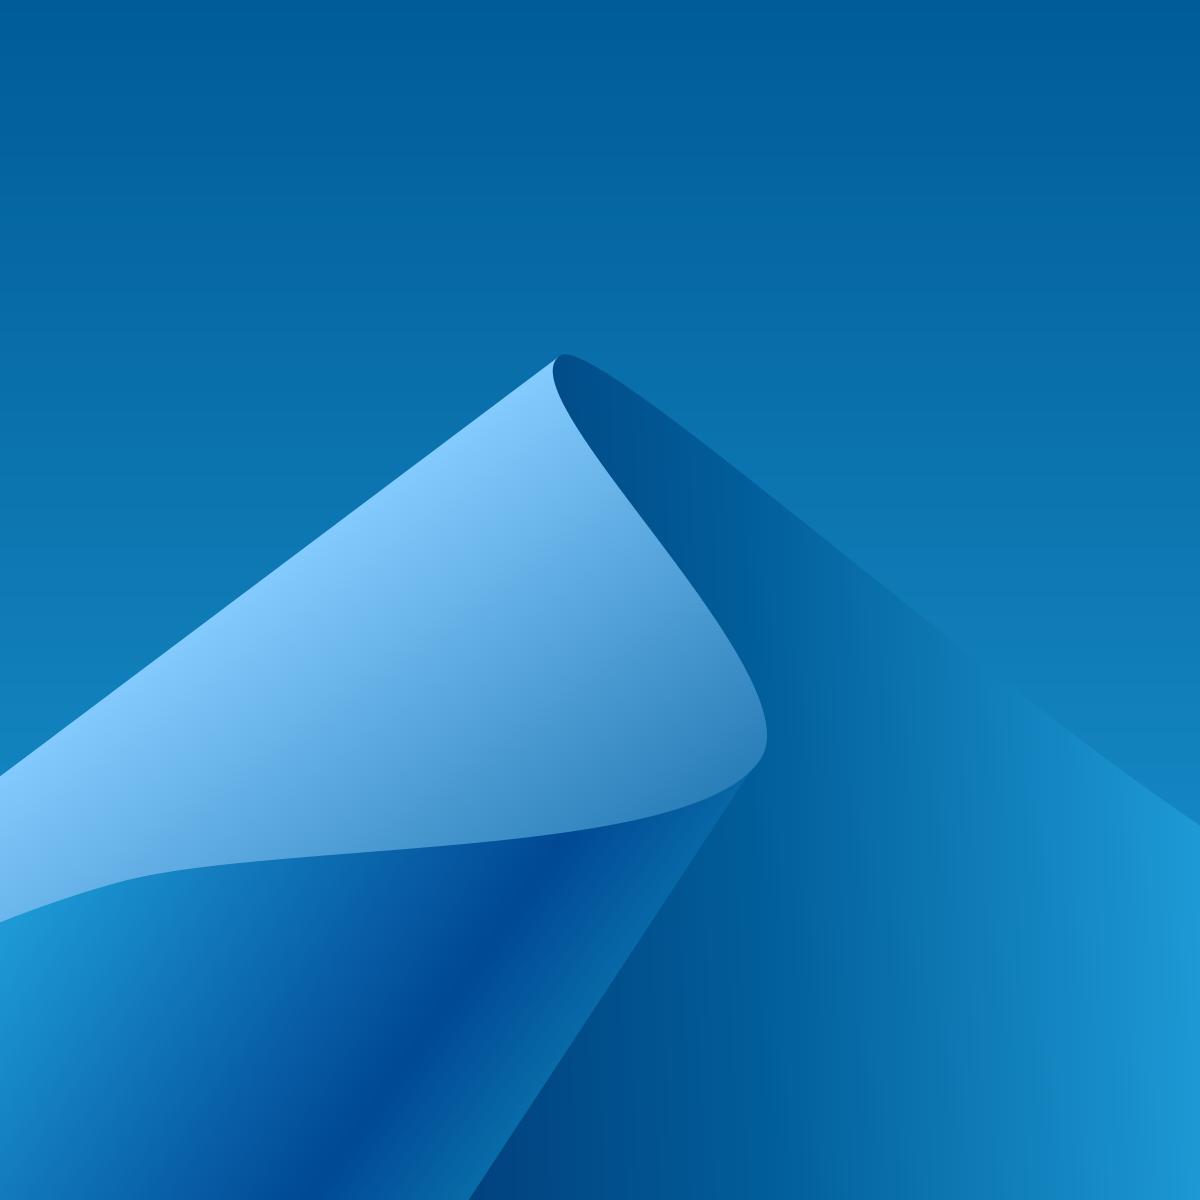 blue-wave1.png